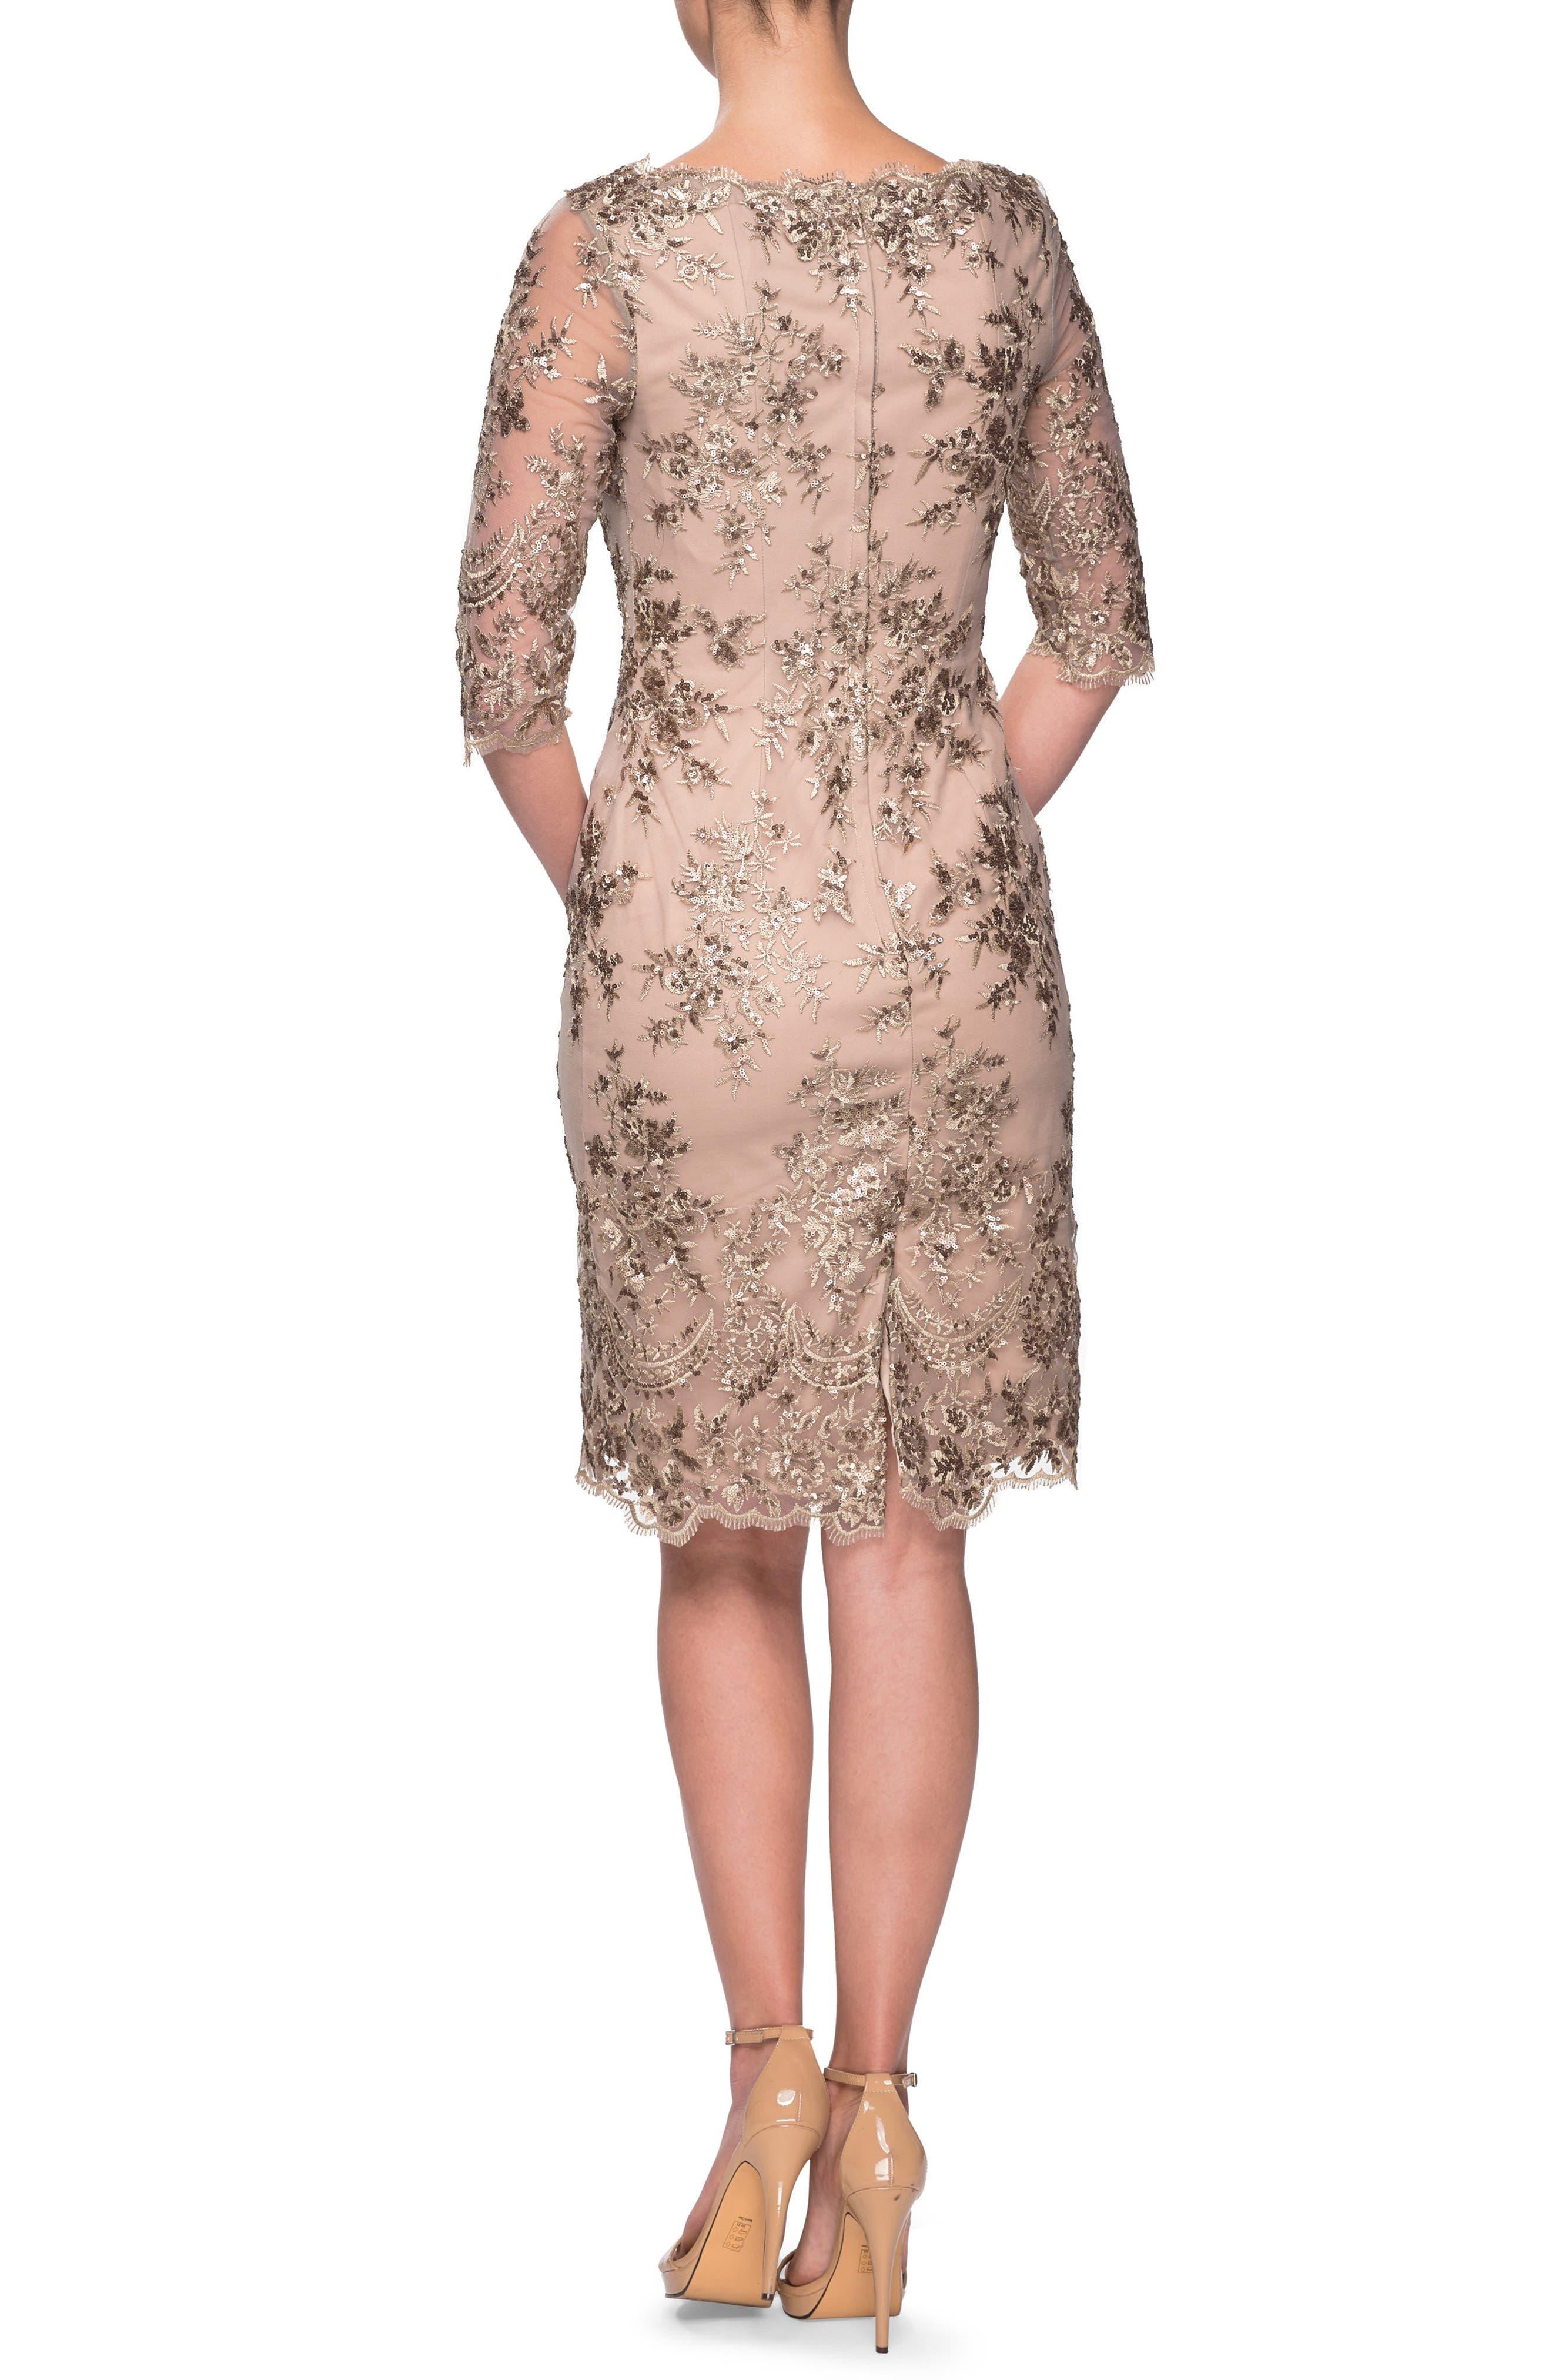 LA FEMME, Embroidered Lace Sheath Dress, Alternate thumbnail 2, color, GOLD/ NUDE